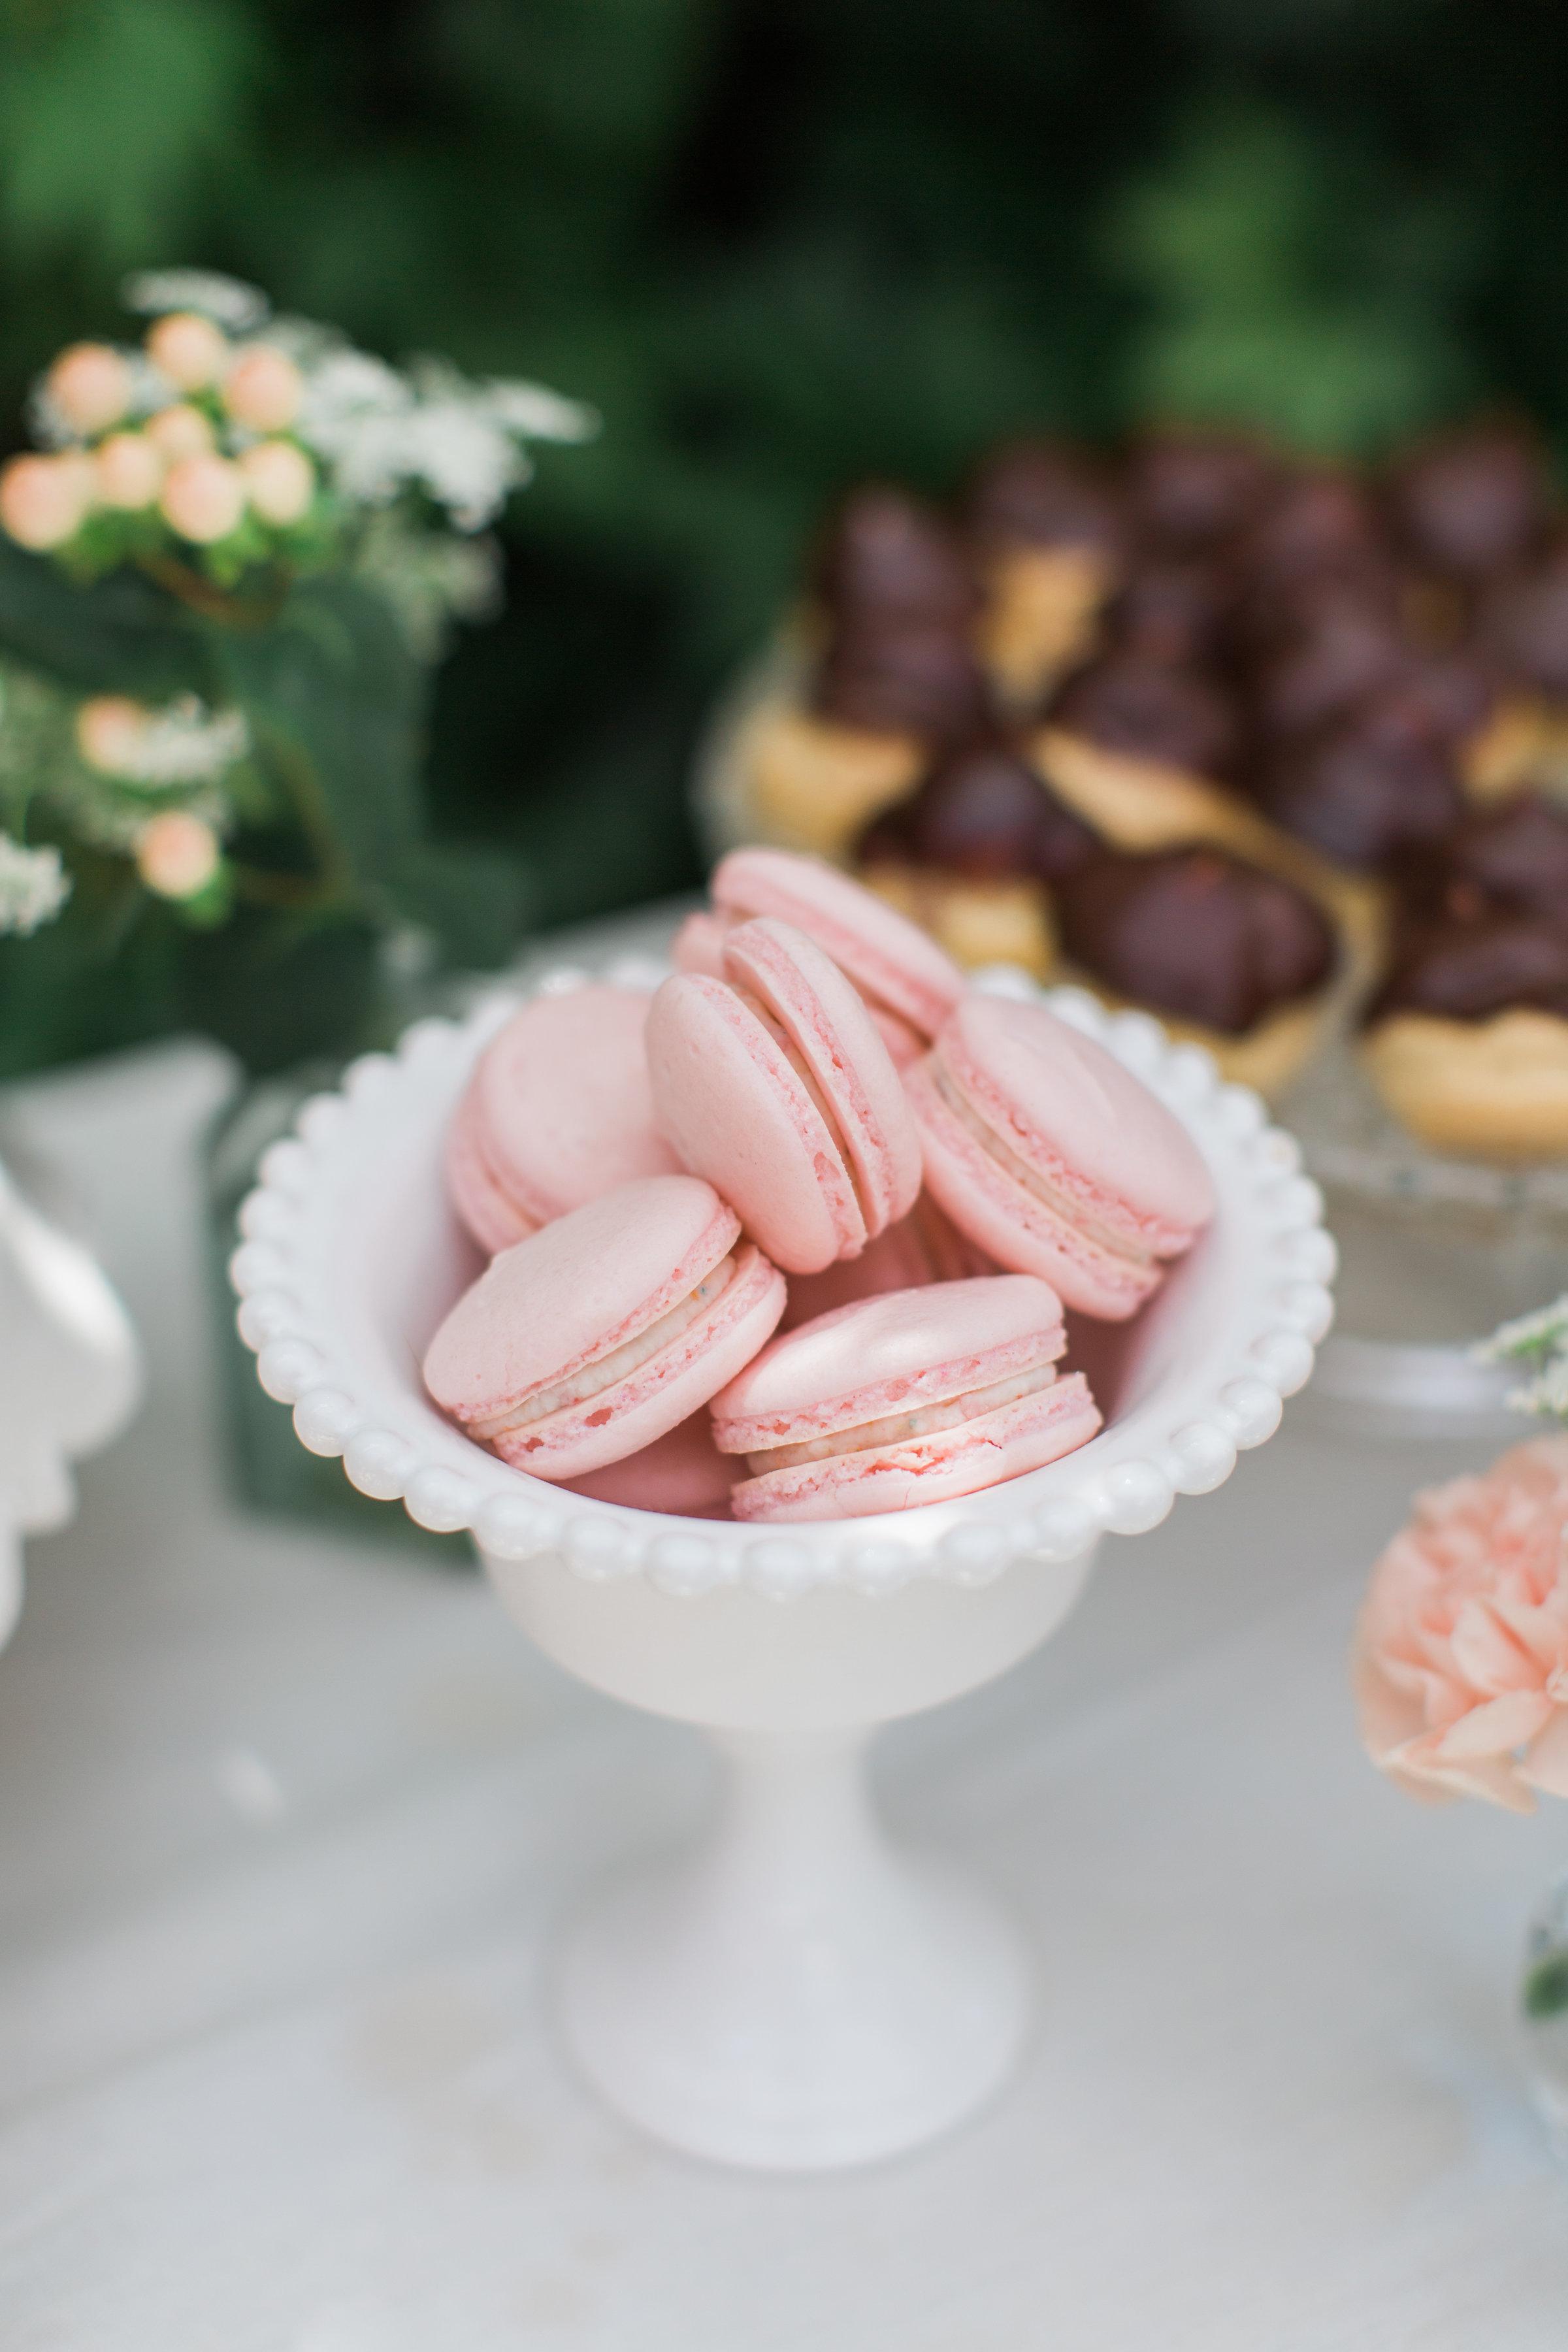 Pine & Sea Photography | vanilla confetti macarons, garden party bridal shower